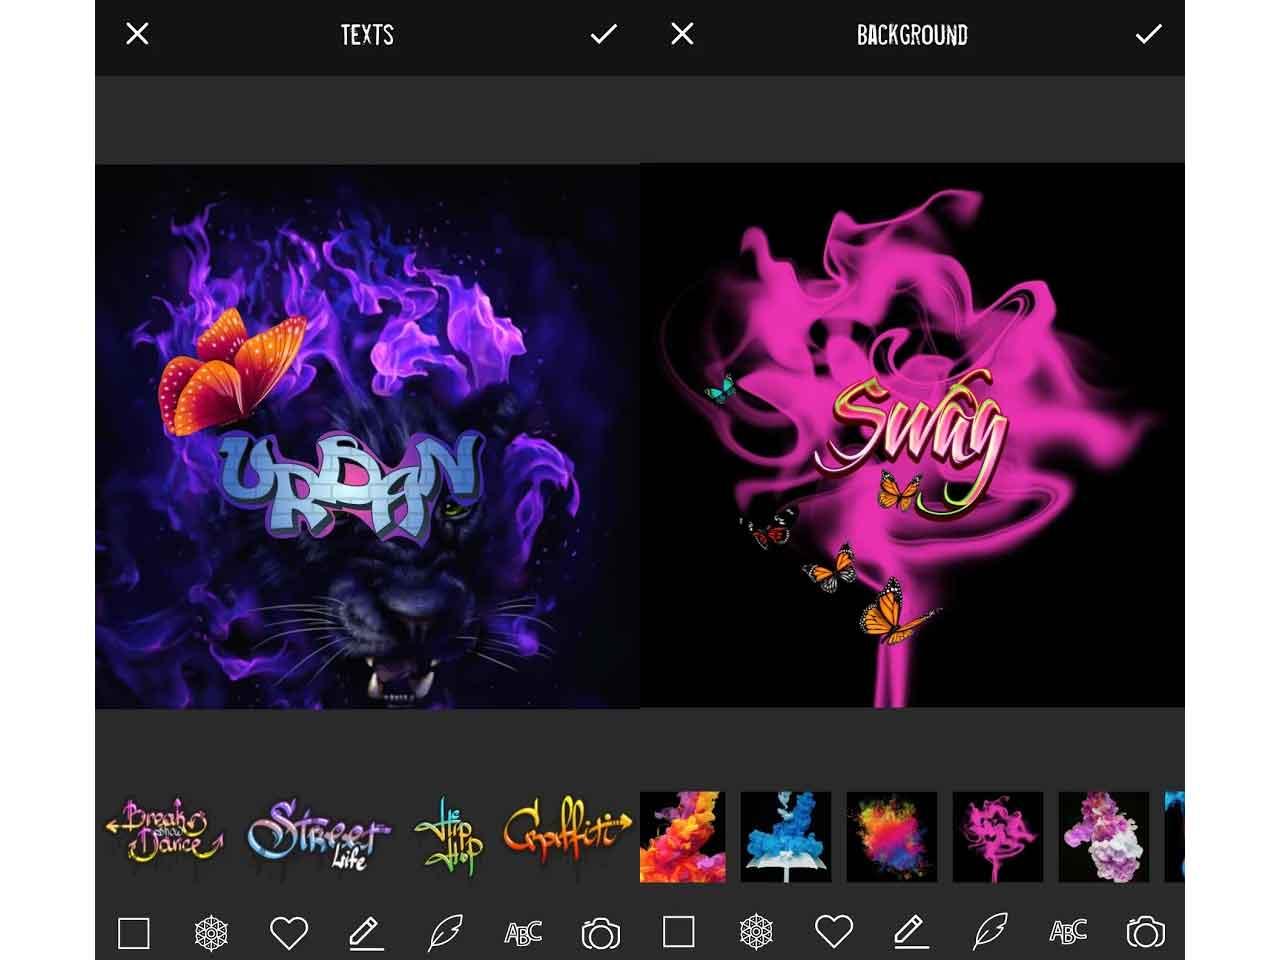 15 Aplikasi Graffiti Terbaik Dan Paling Keren Di Android